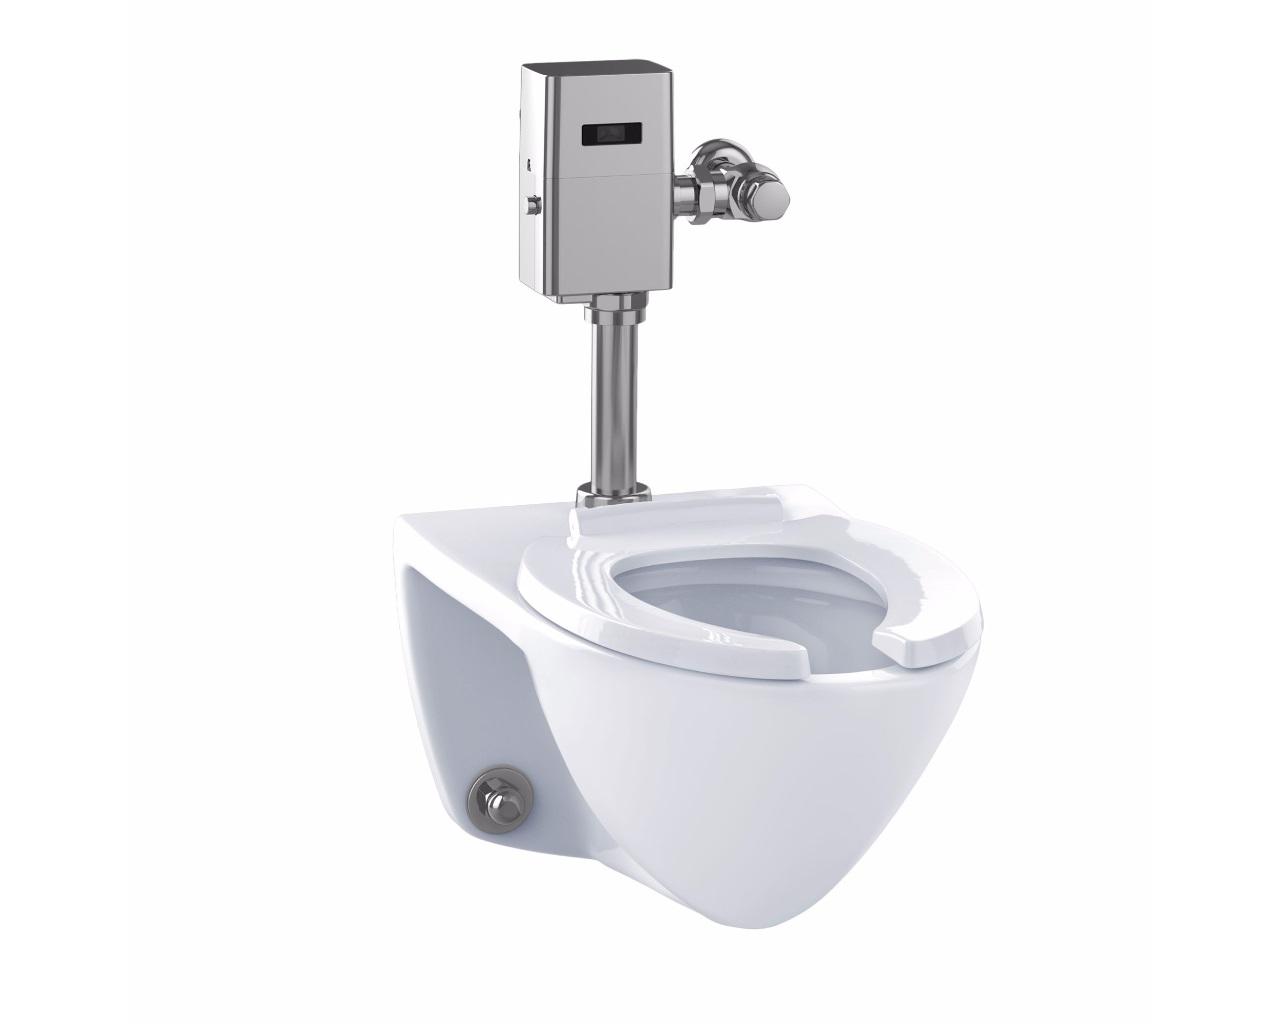 Commercial 1G Flushometer High Efficiency Toilet, Elongated Bowl ...